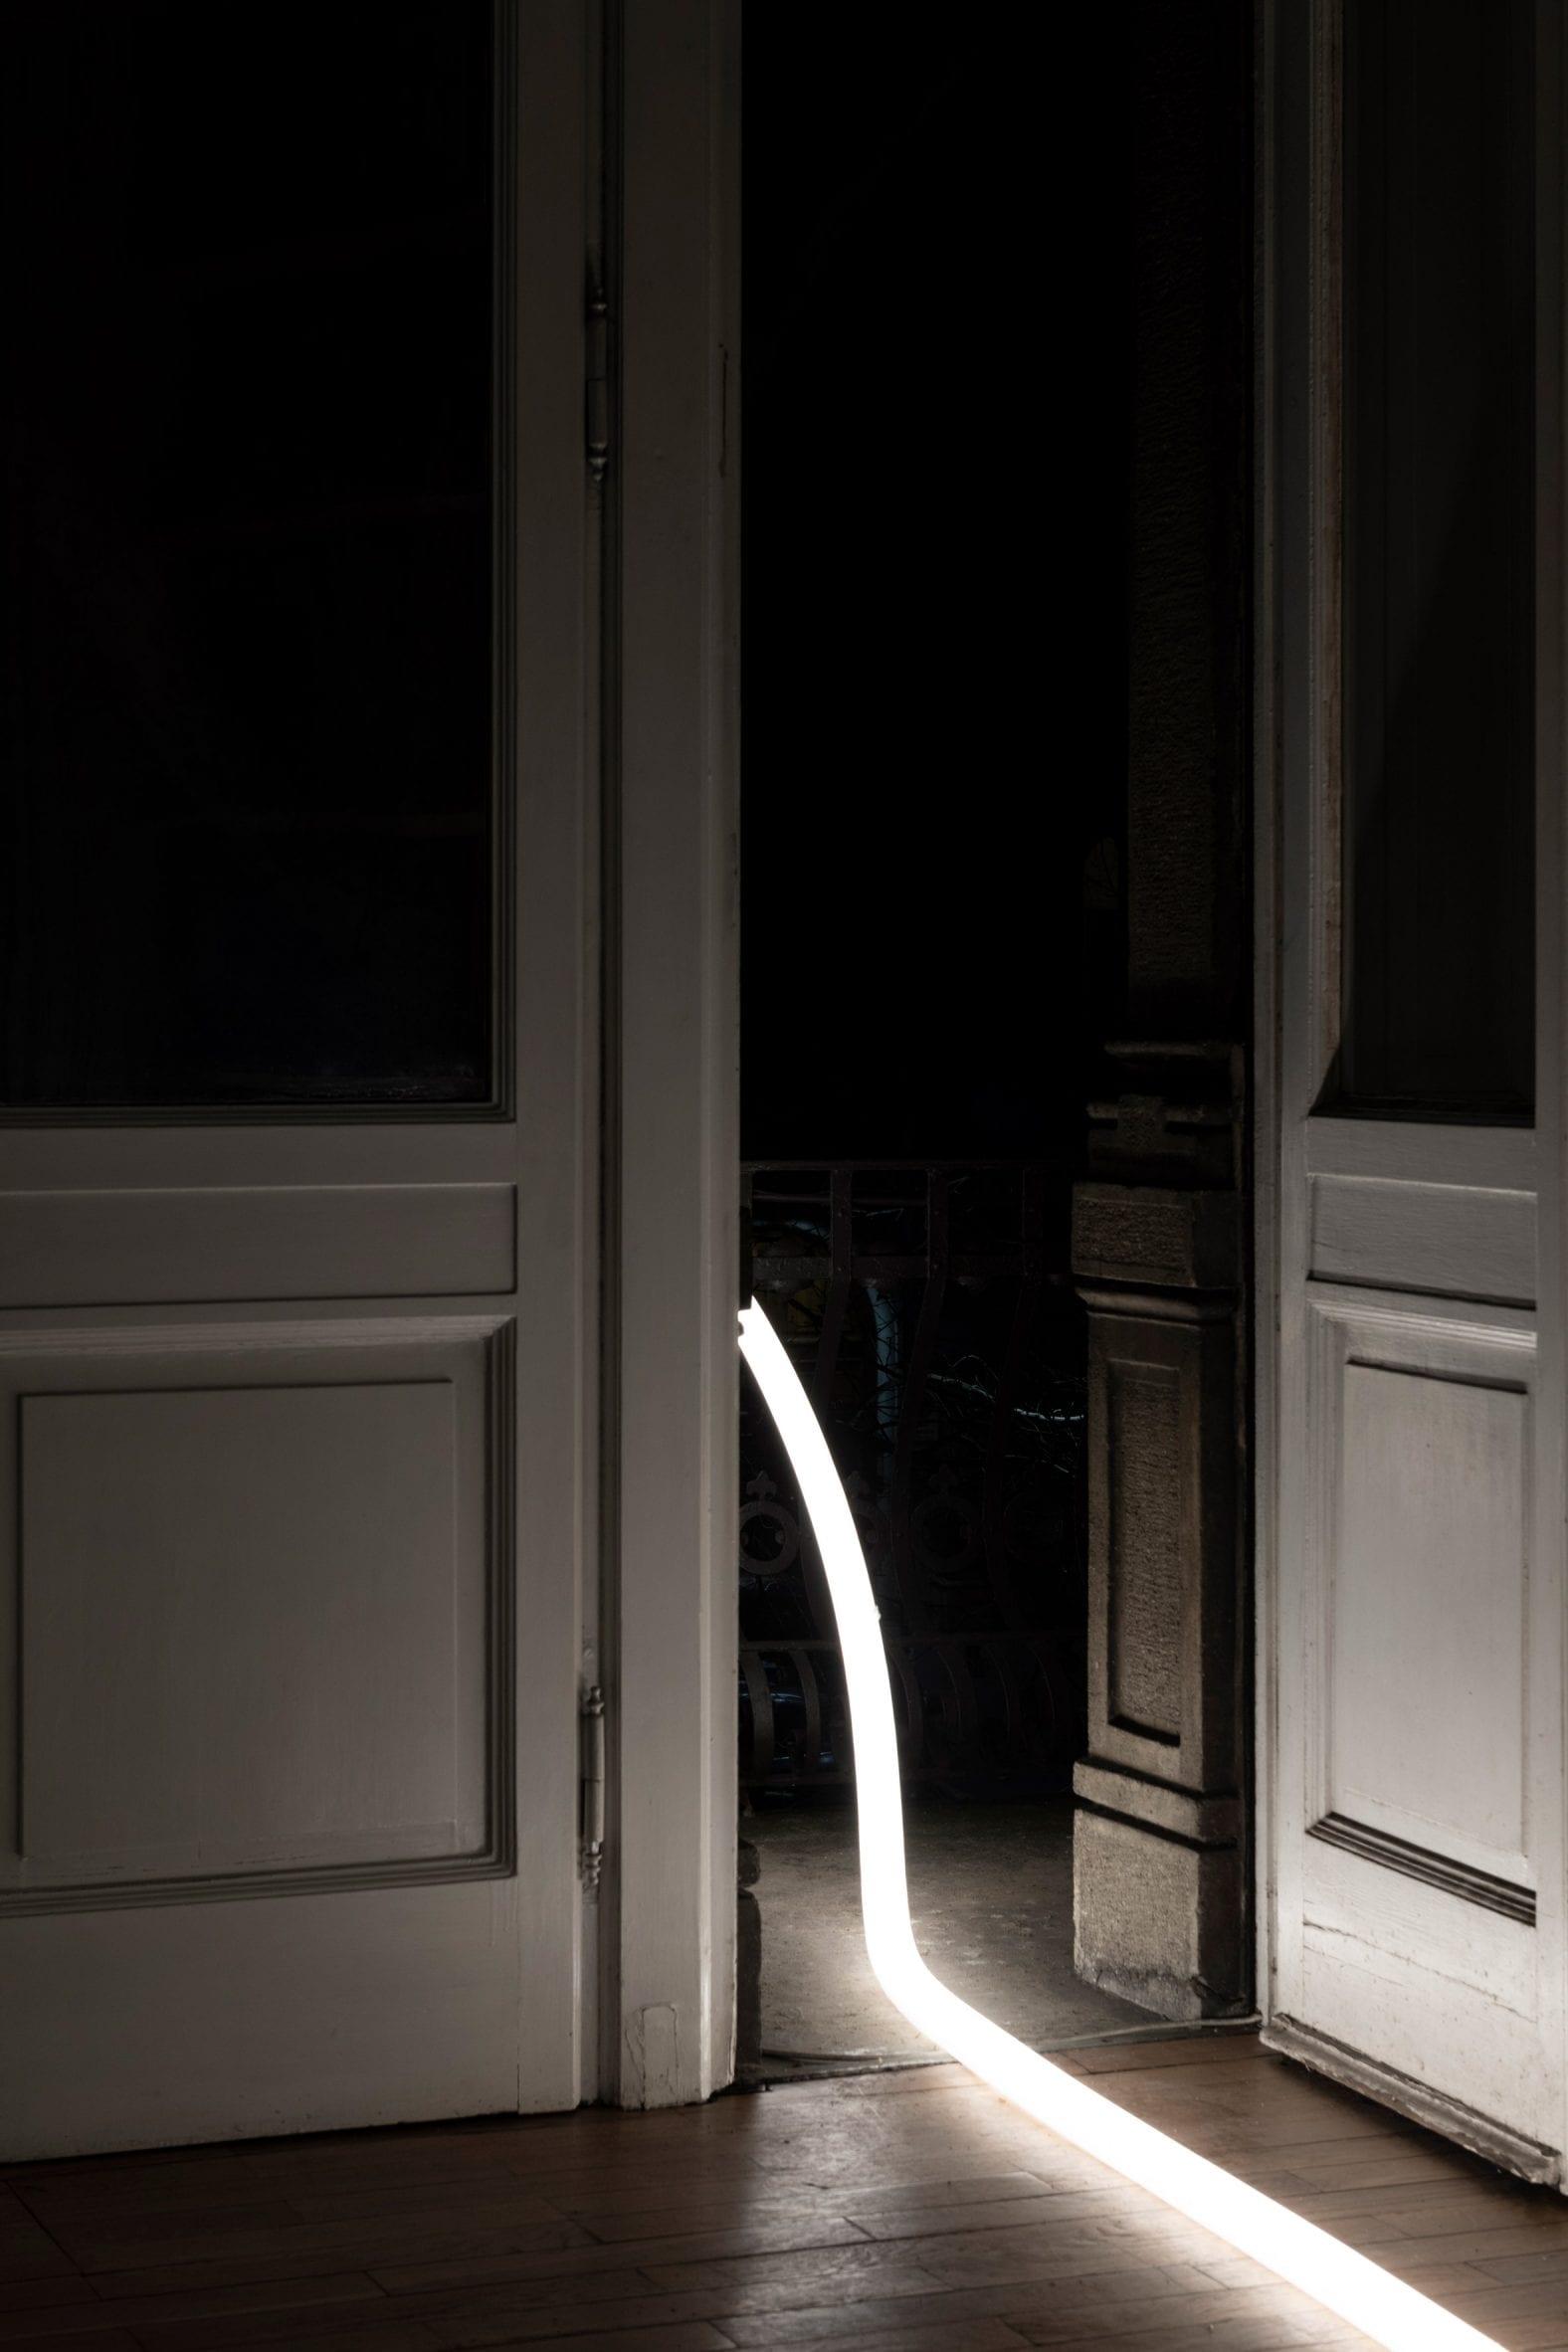 La Linea light inside a doorframe